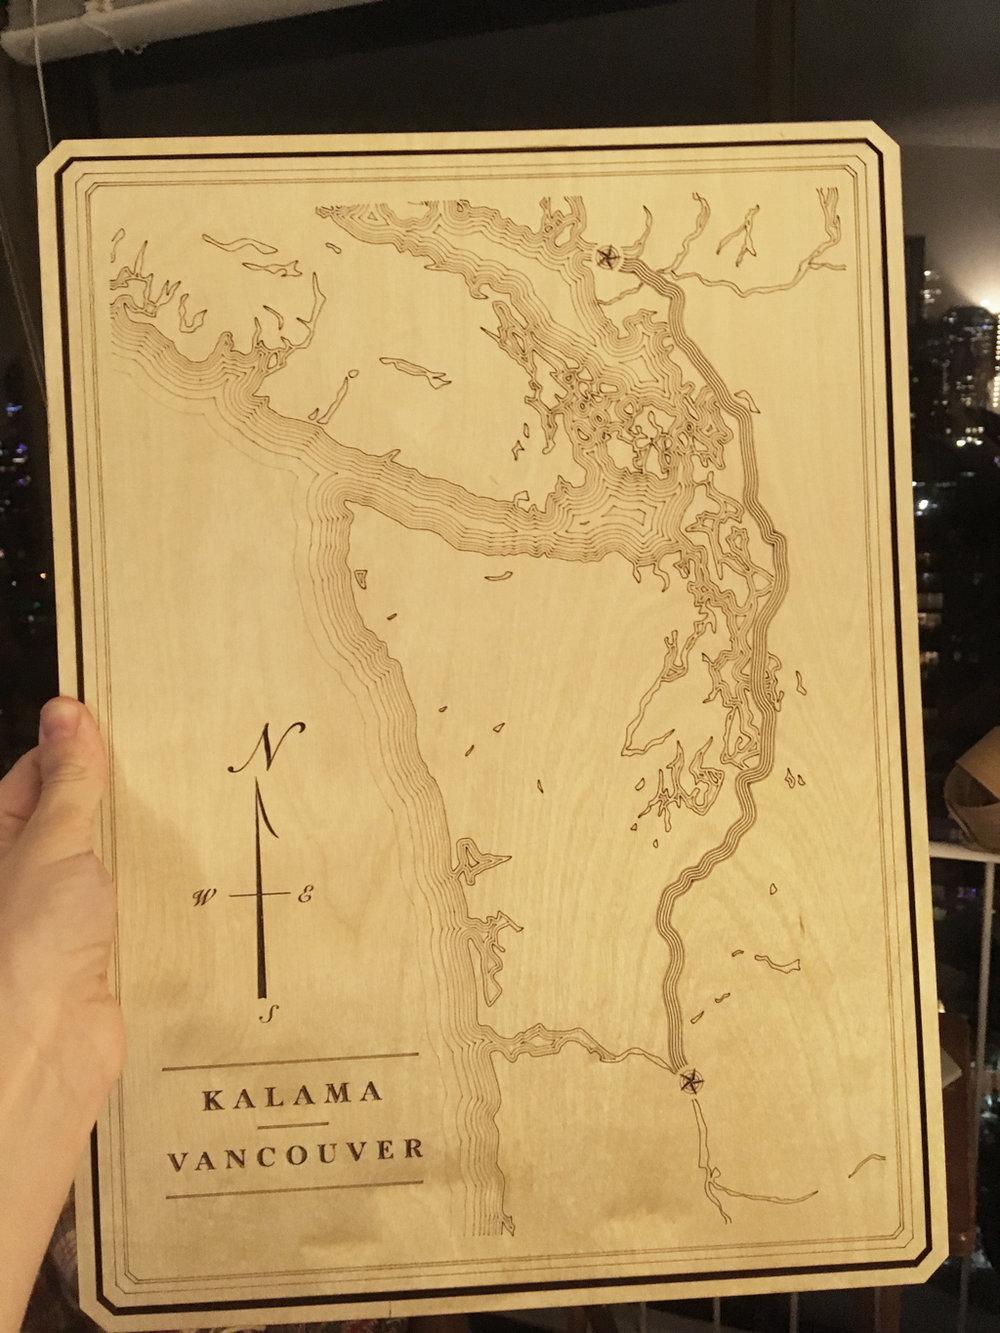 Kalama to Vancouver